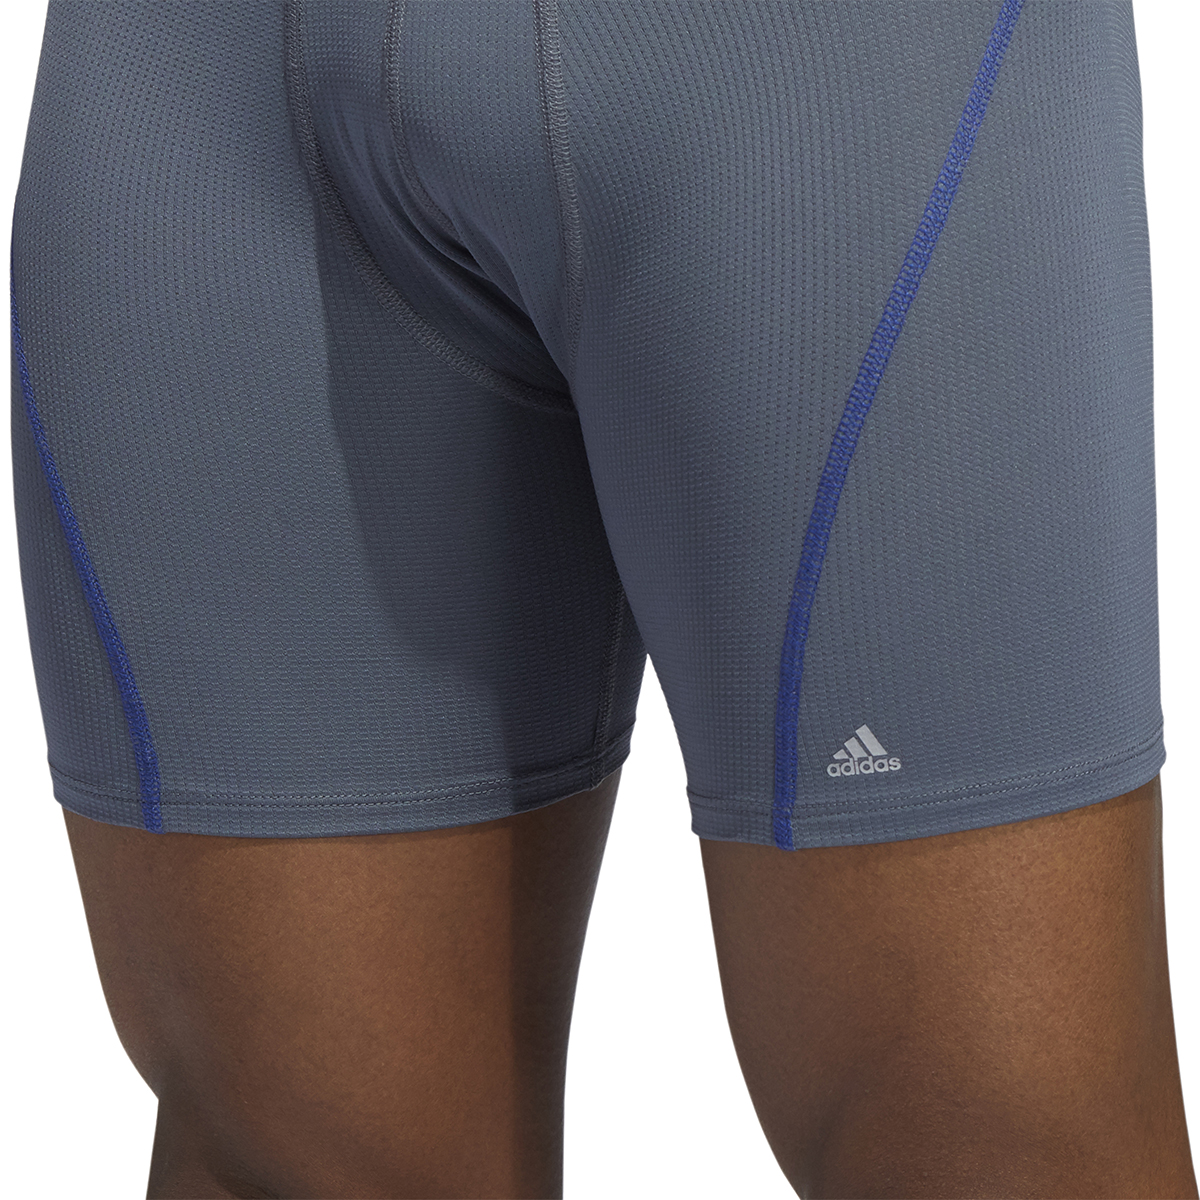 Men's Adidas Performance Mesh 3 Pack Boxer Briefs - Color: Onix Grey/Blue - Size: S, Onix Grey/Blue, large, image 6